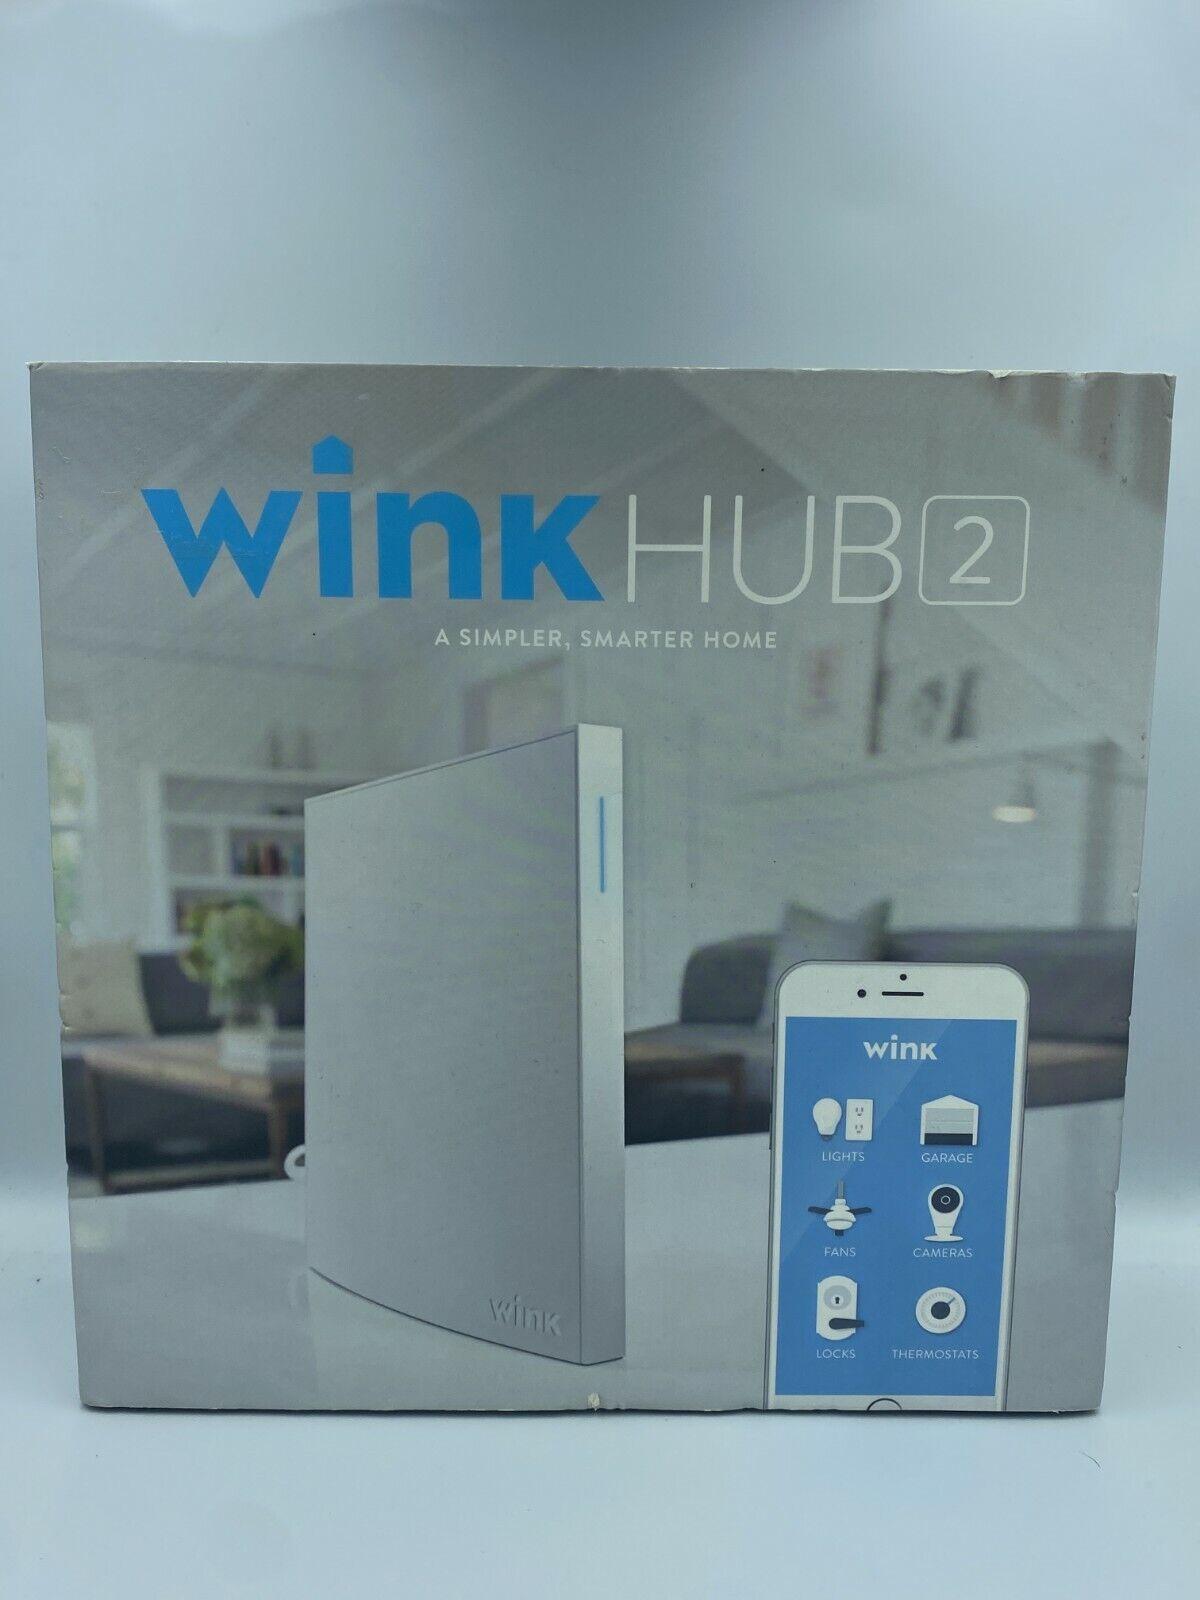 Wink Hub 2 | WNKHUB-2US | Smart Home Automation - NEW IN BOX